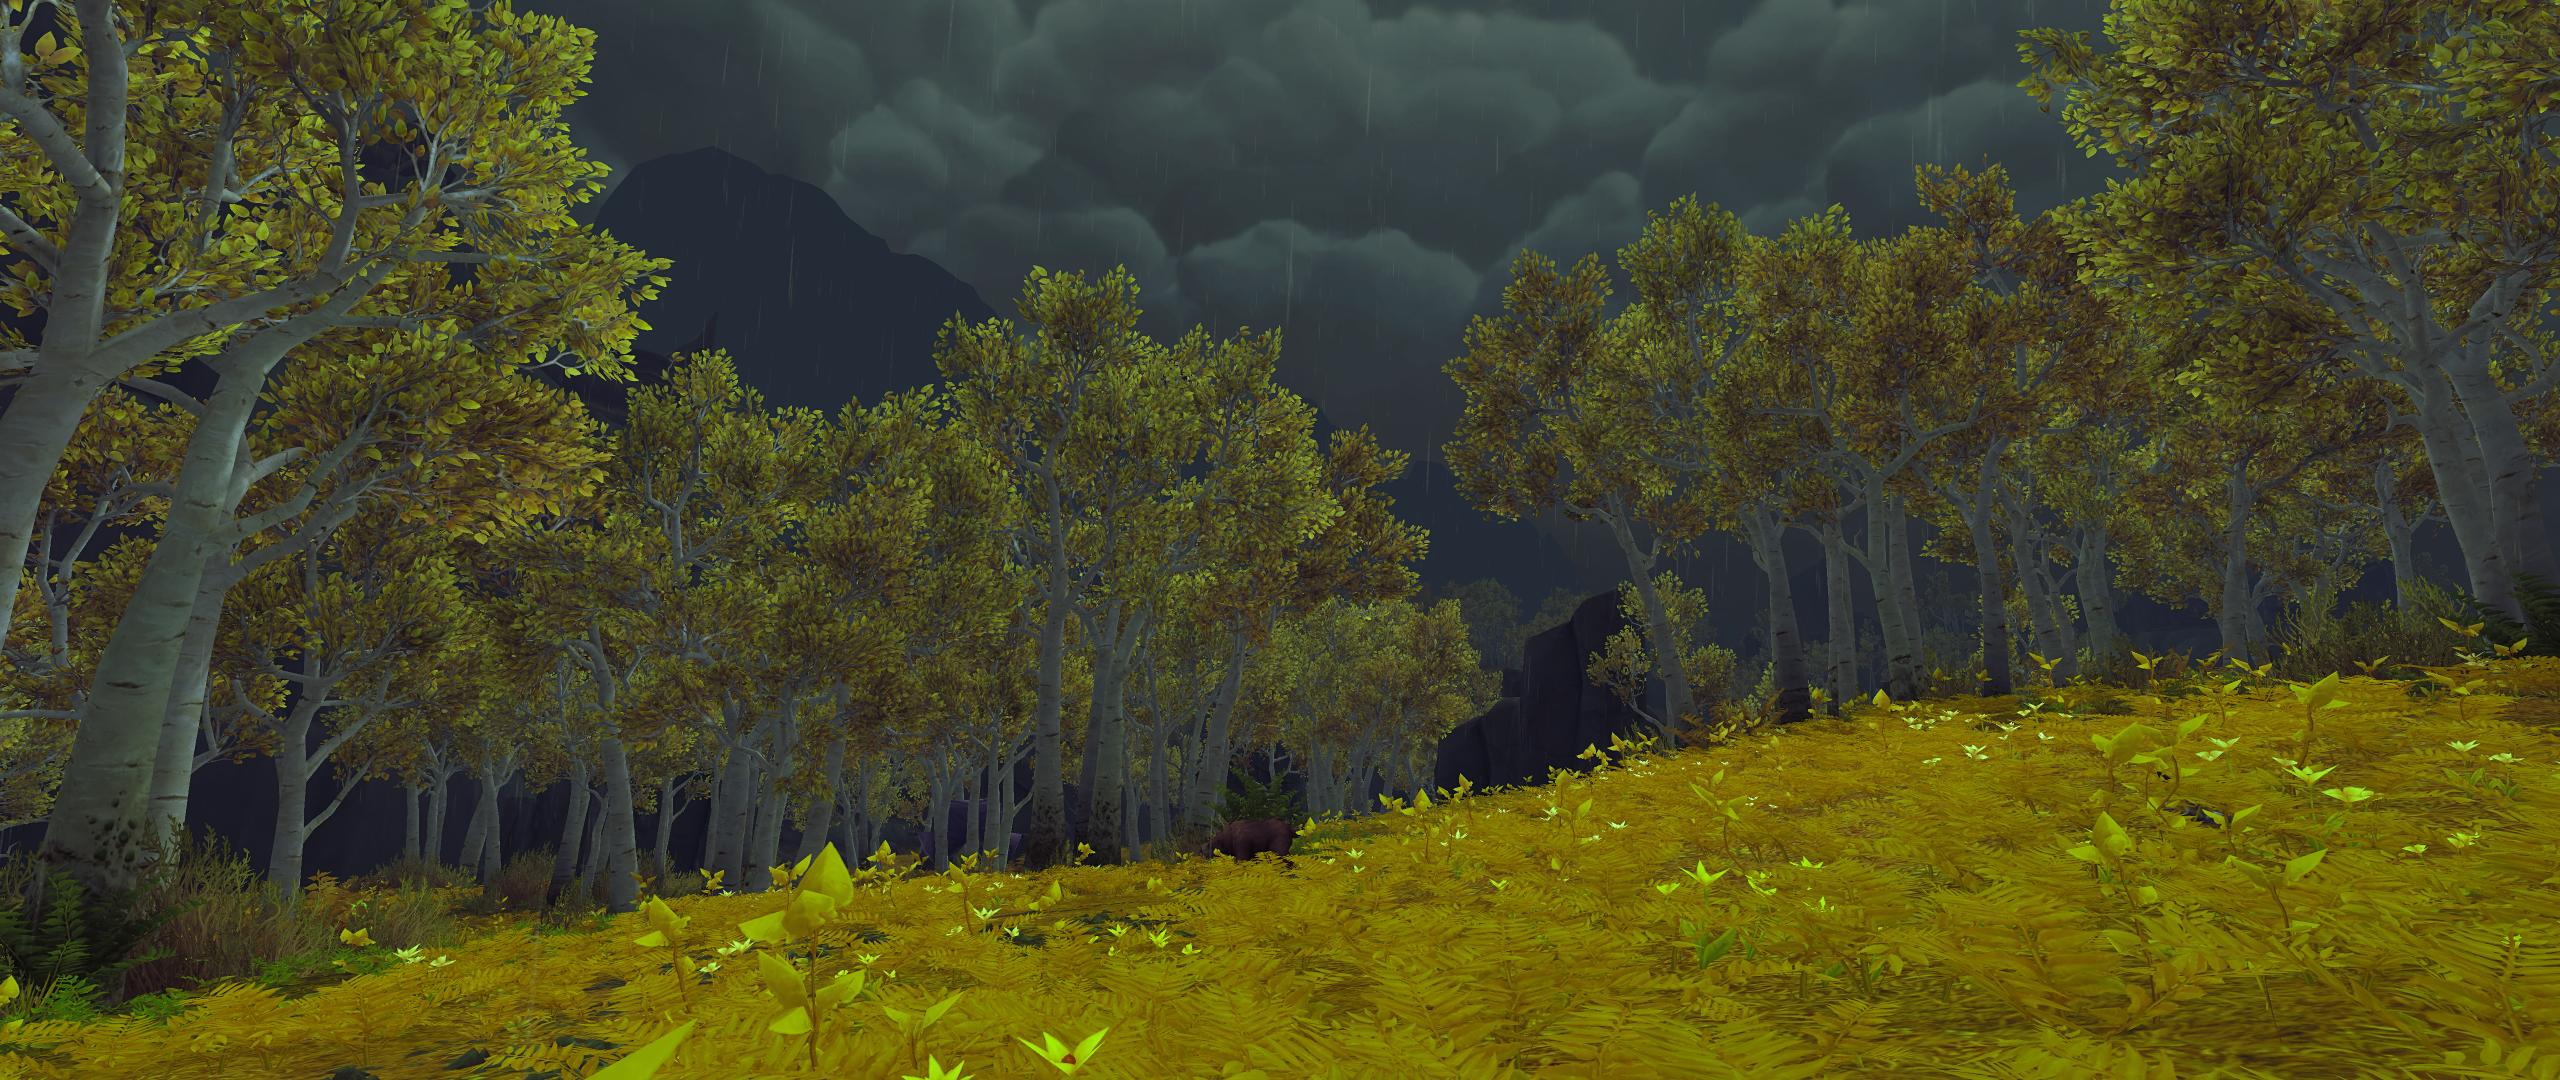 World Of Warcraft Screenshot 2018.08.23 - 11.38.59.44.png - World of Warcraft